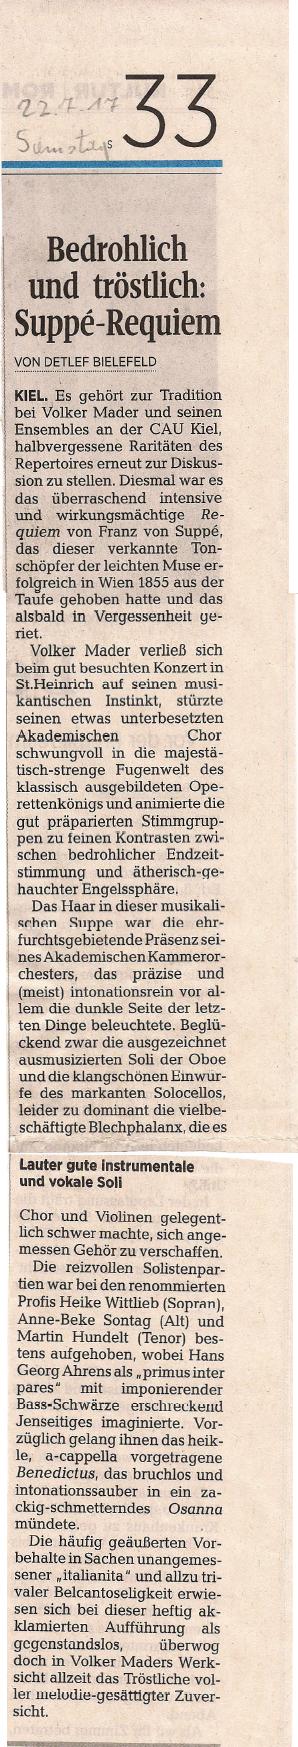 Konzertkritik